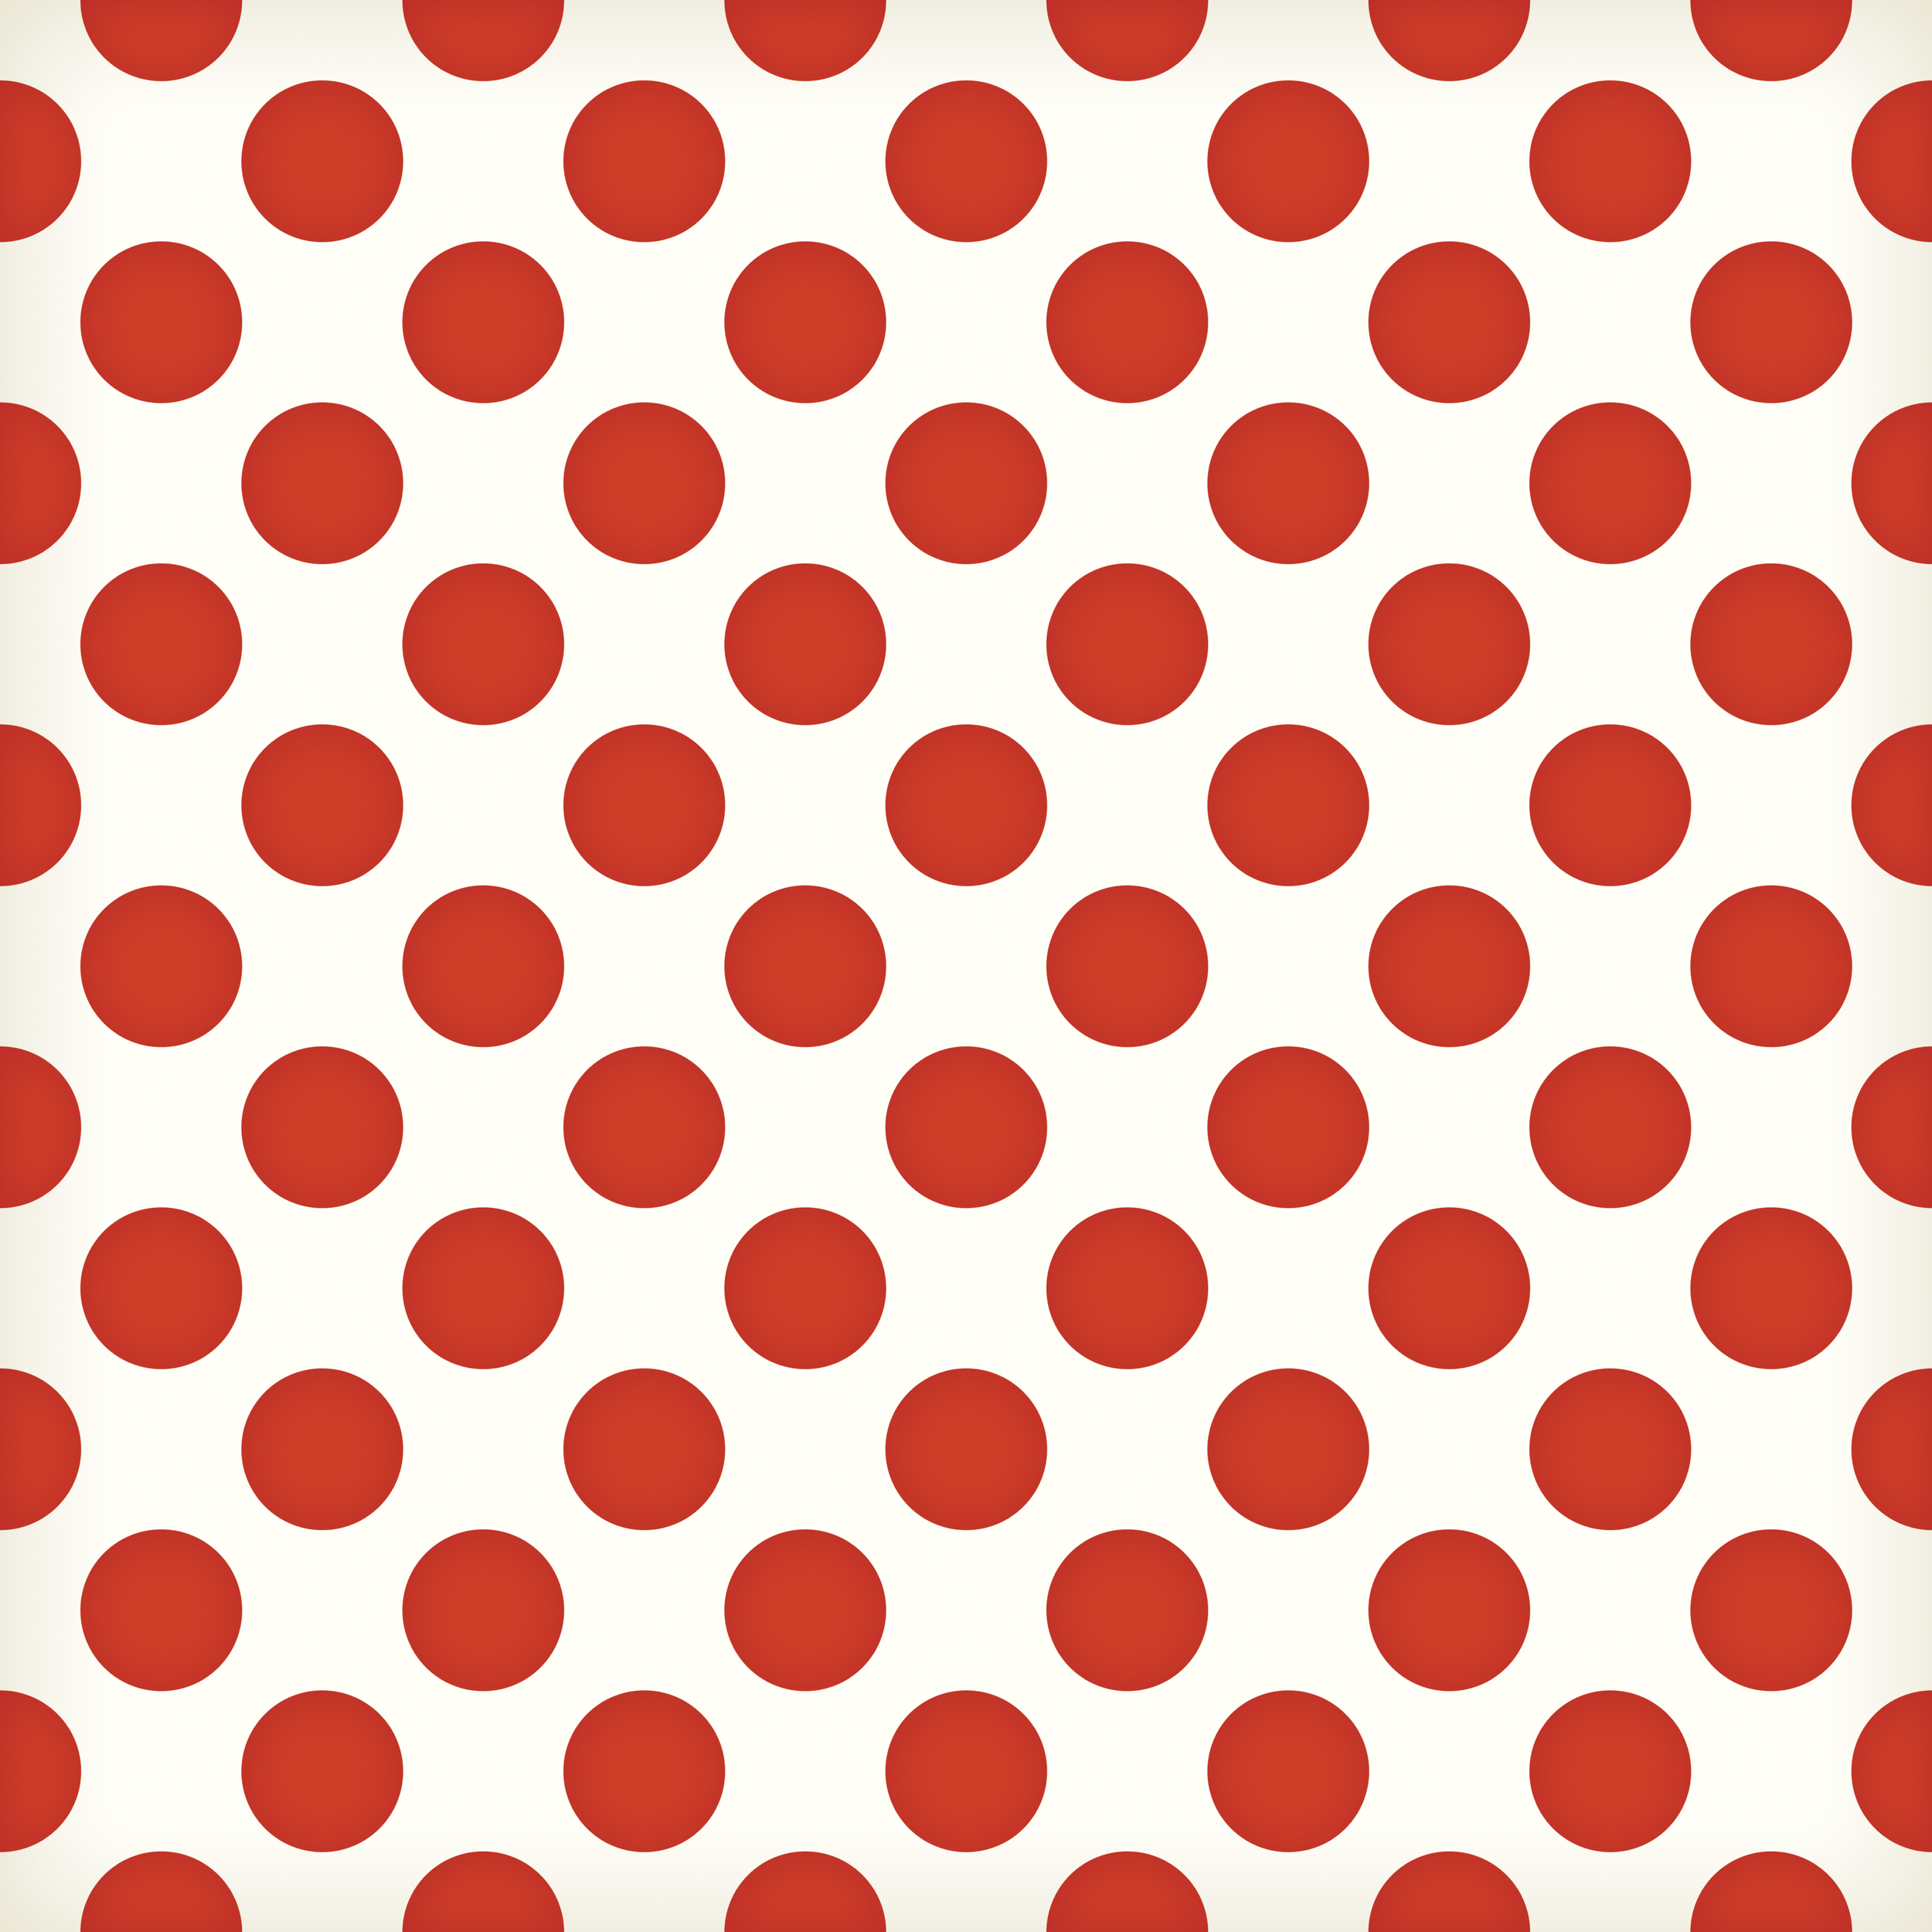 large red polka